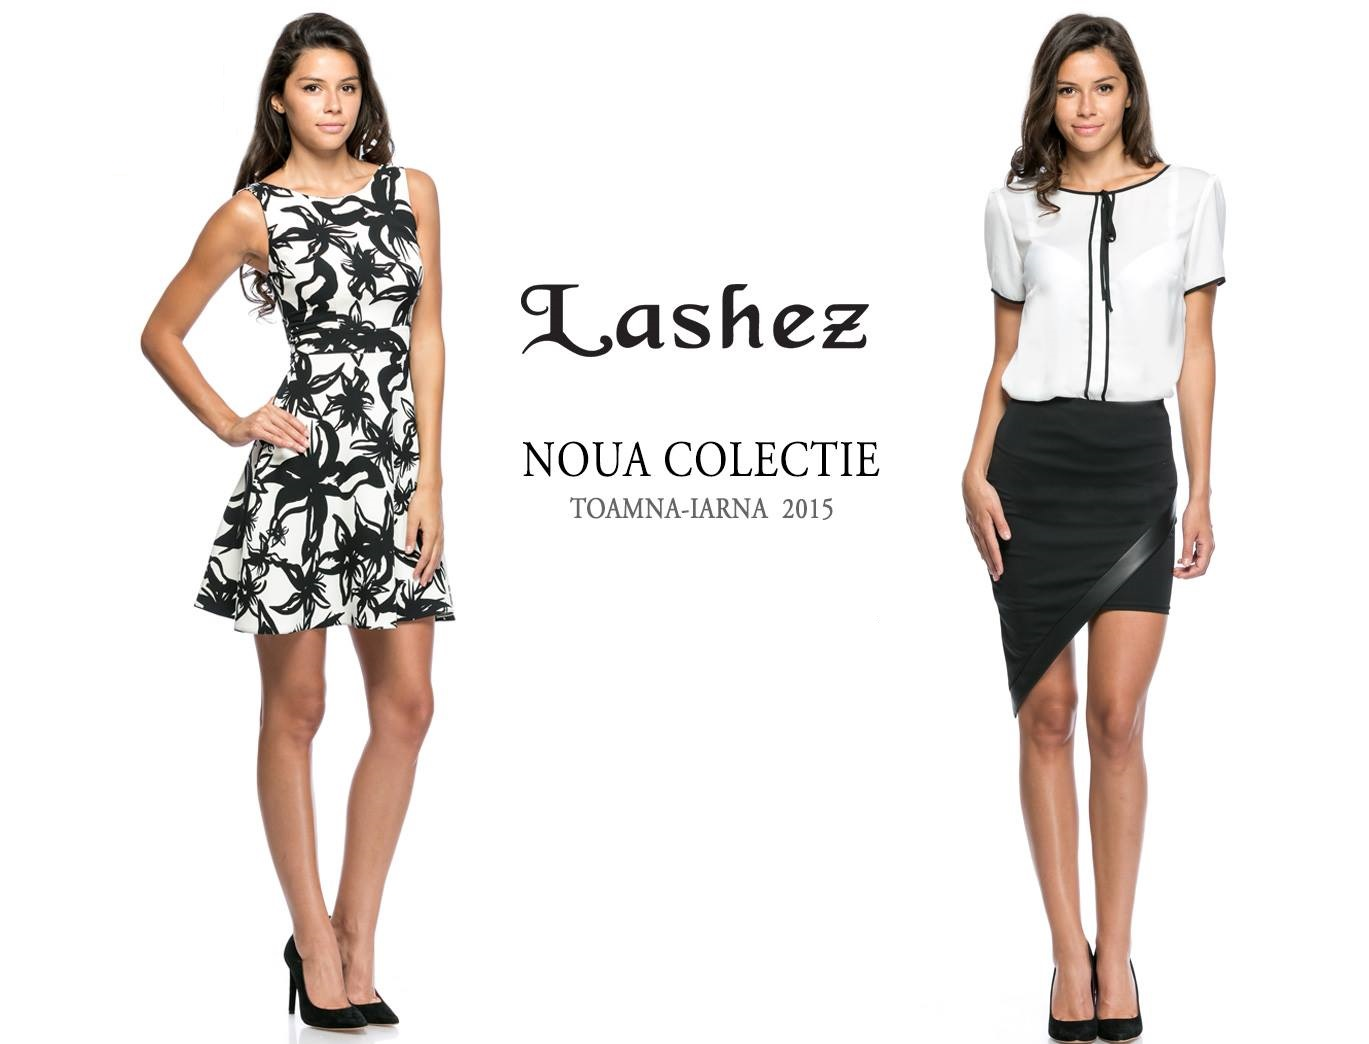 lashez-iasi-colectia-toamna-iarna-2015